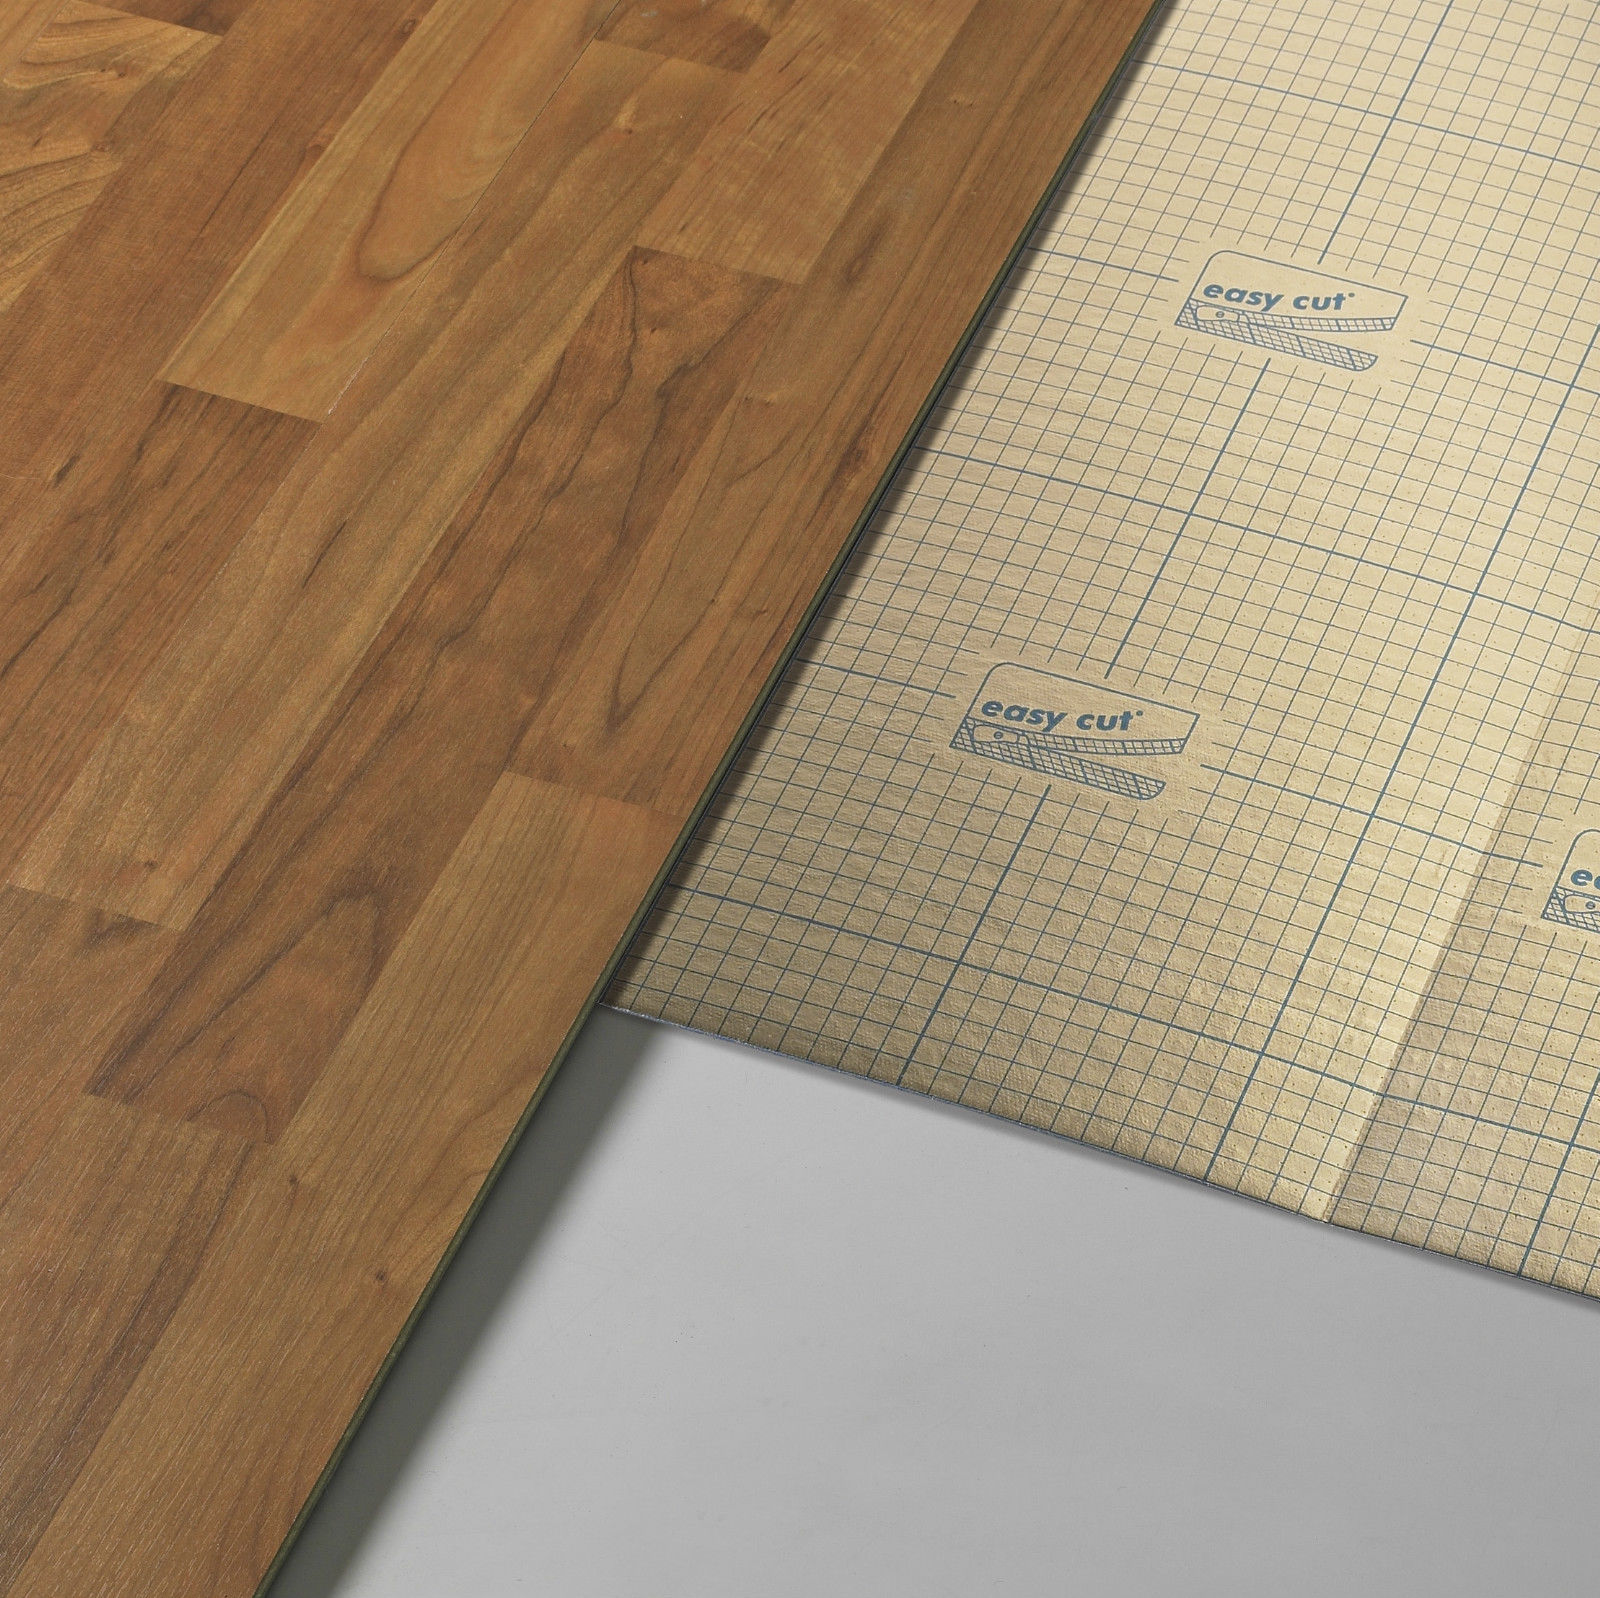 hori vinylboden pvc klick boden eiche adelaide. Black Bedroom Furniture Sets. Home Design Ideas